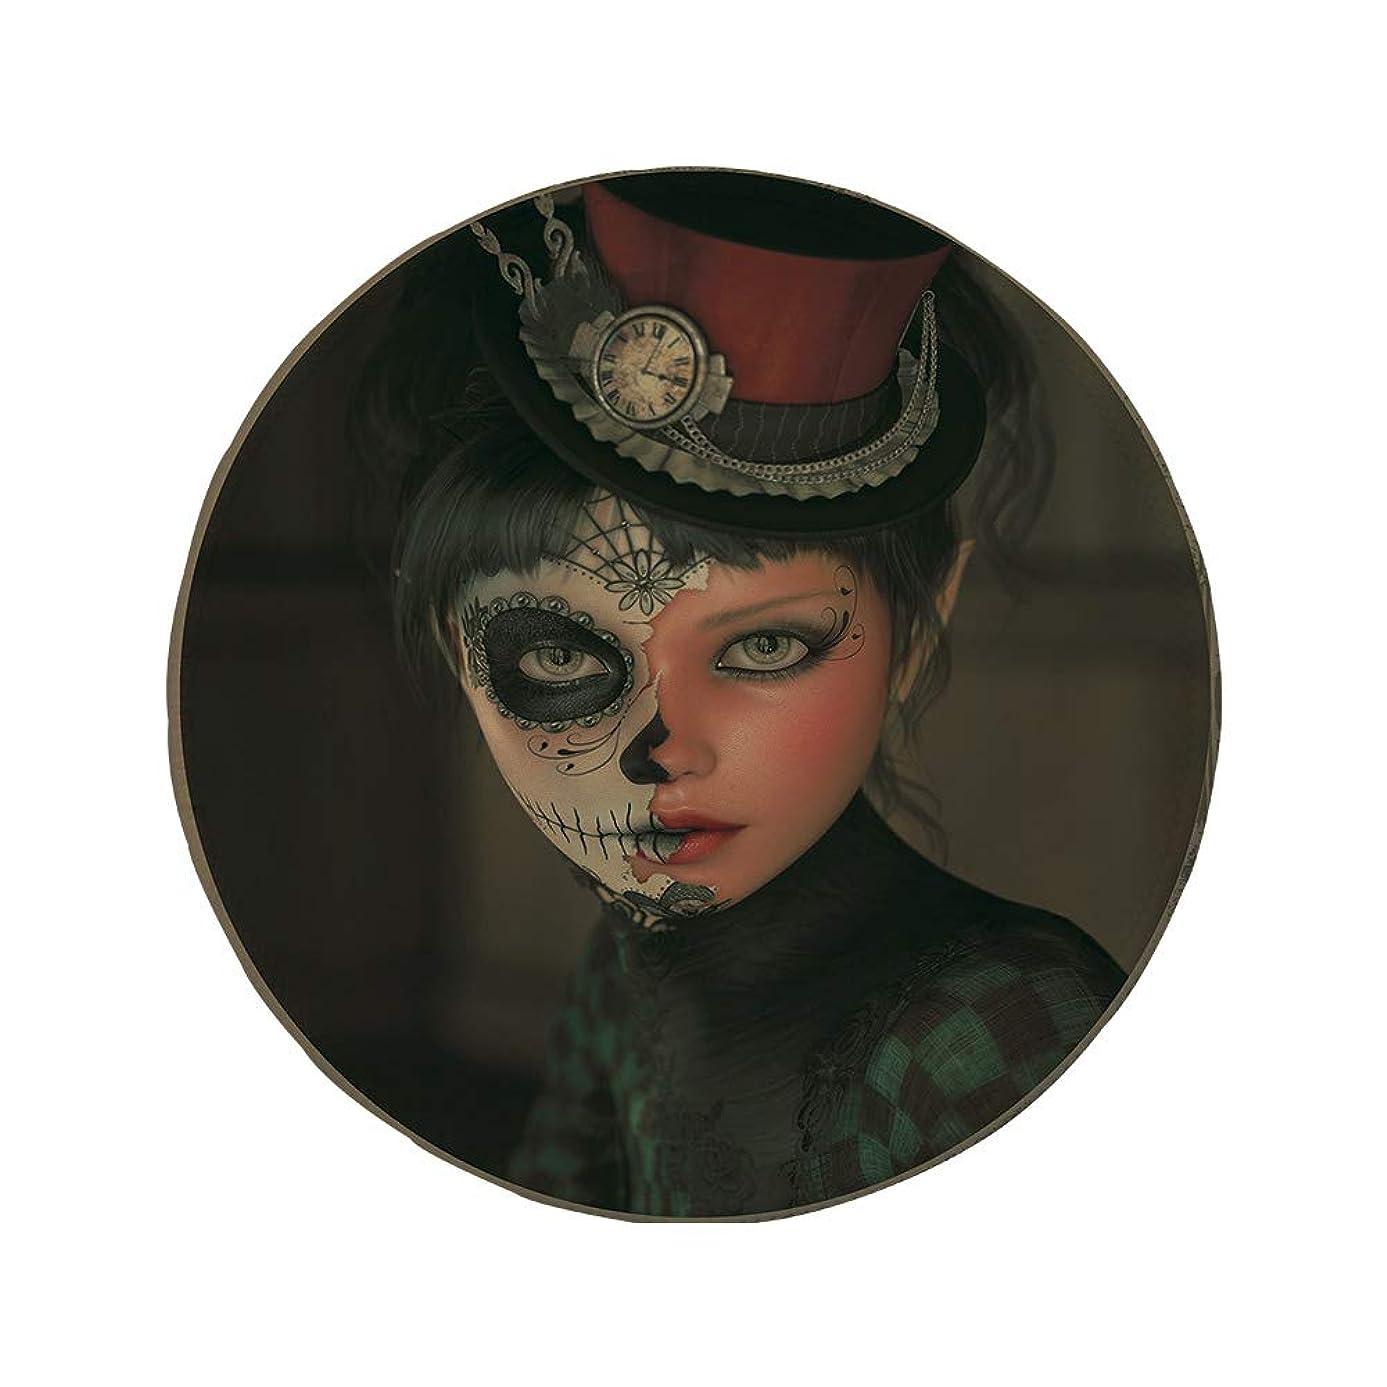 Non-Slip Rubber Round Mouse Pad,Sugar Skull Decor,Antique Portrait Girl with Calavera Inspired Makeup and Topper Realistic Decorative,Multicolor,7.87